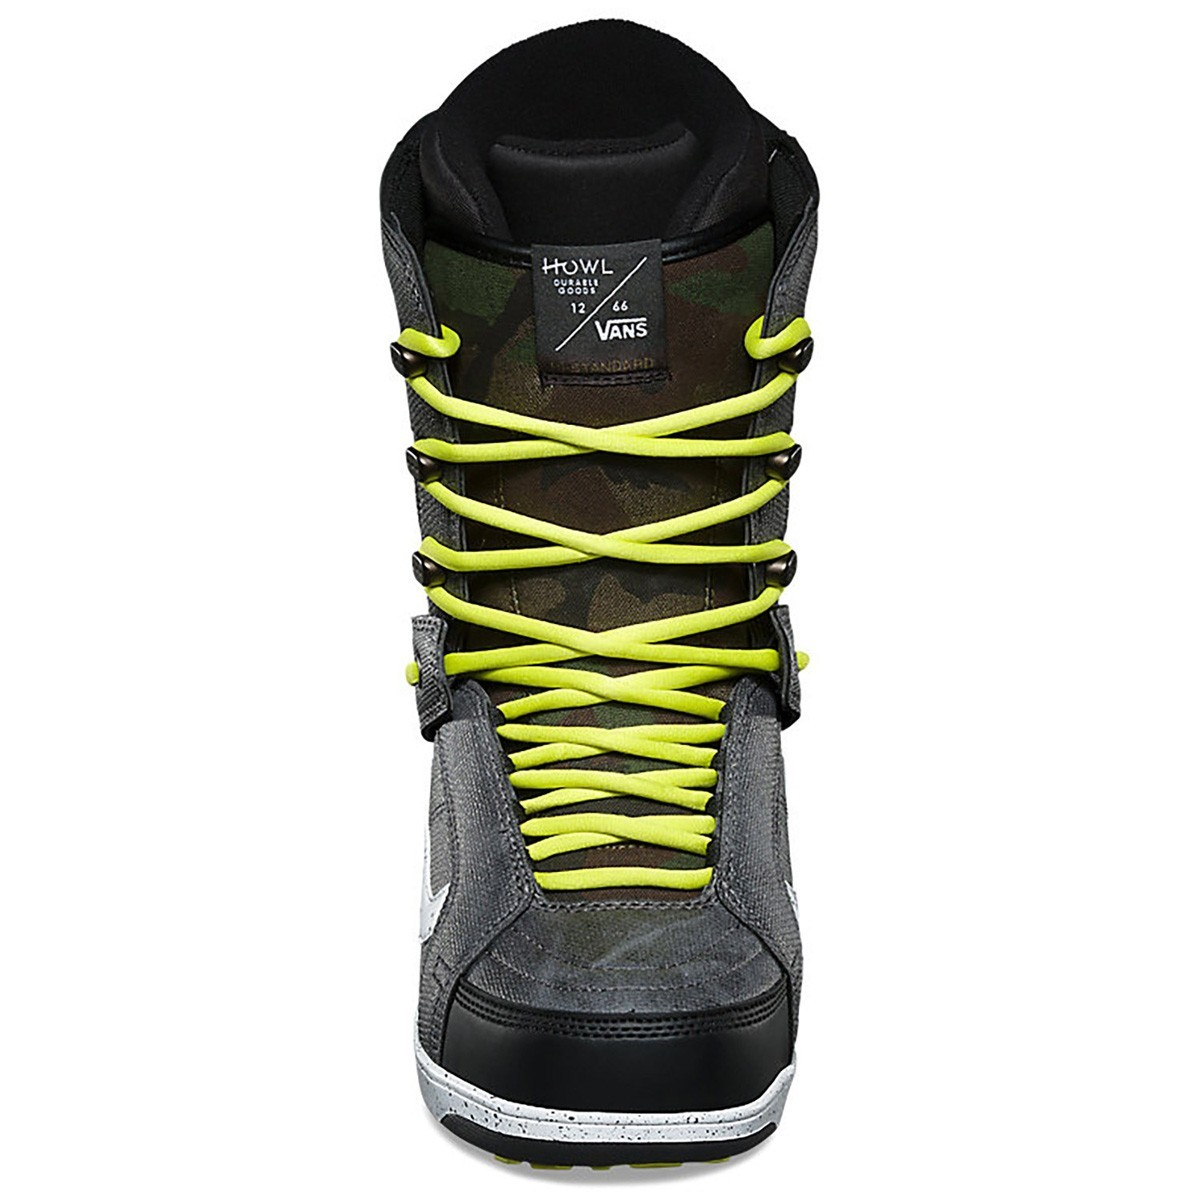 Ботинки Для Сноуборда Vans 2017-18 Mn Hi-Standard (Howl) Black